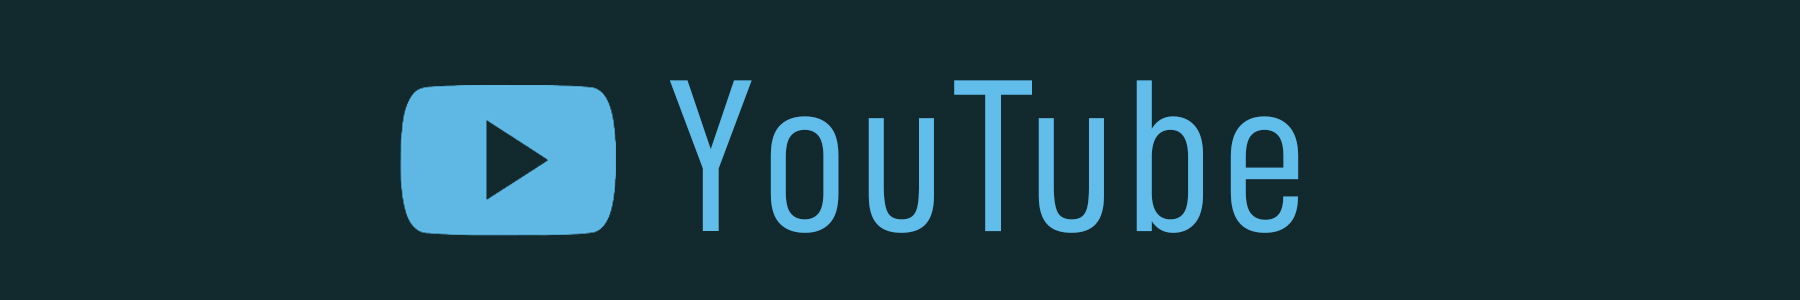 2YouTube.jpg